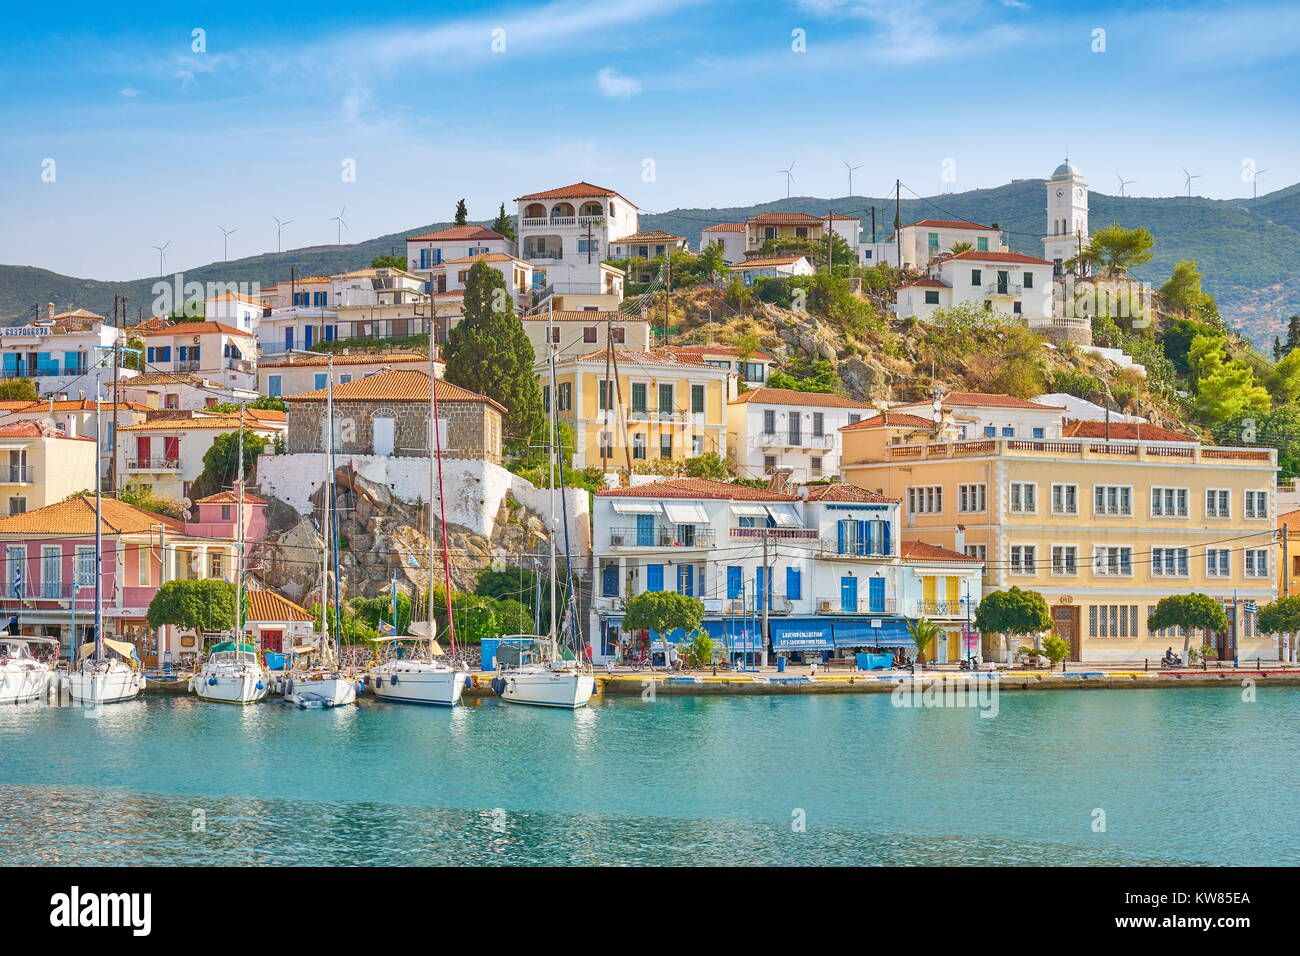 Poros Island, Argolida, Peloponnese, Greece - Stock Image